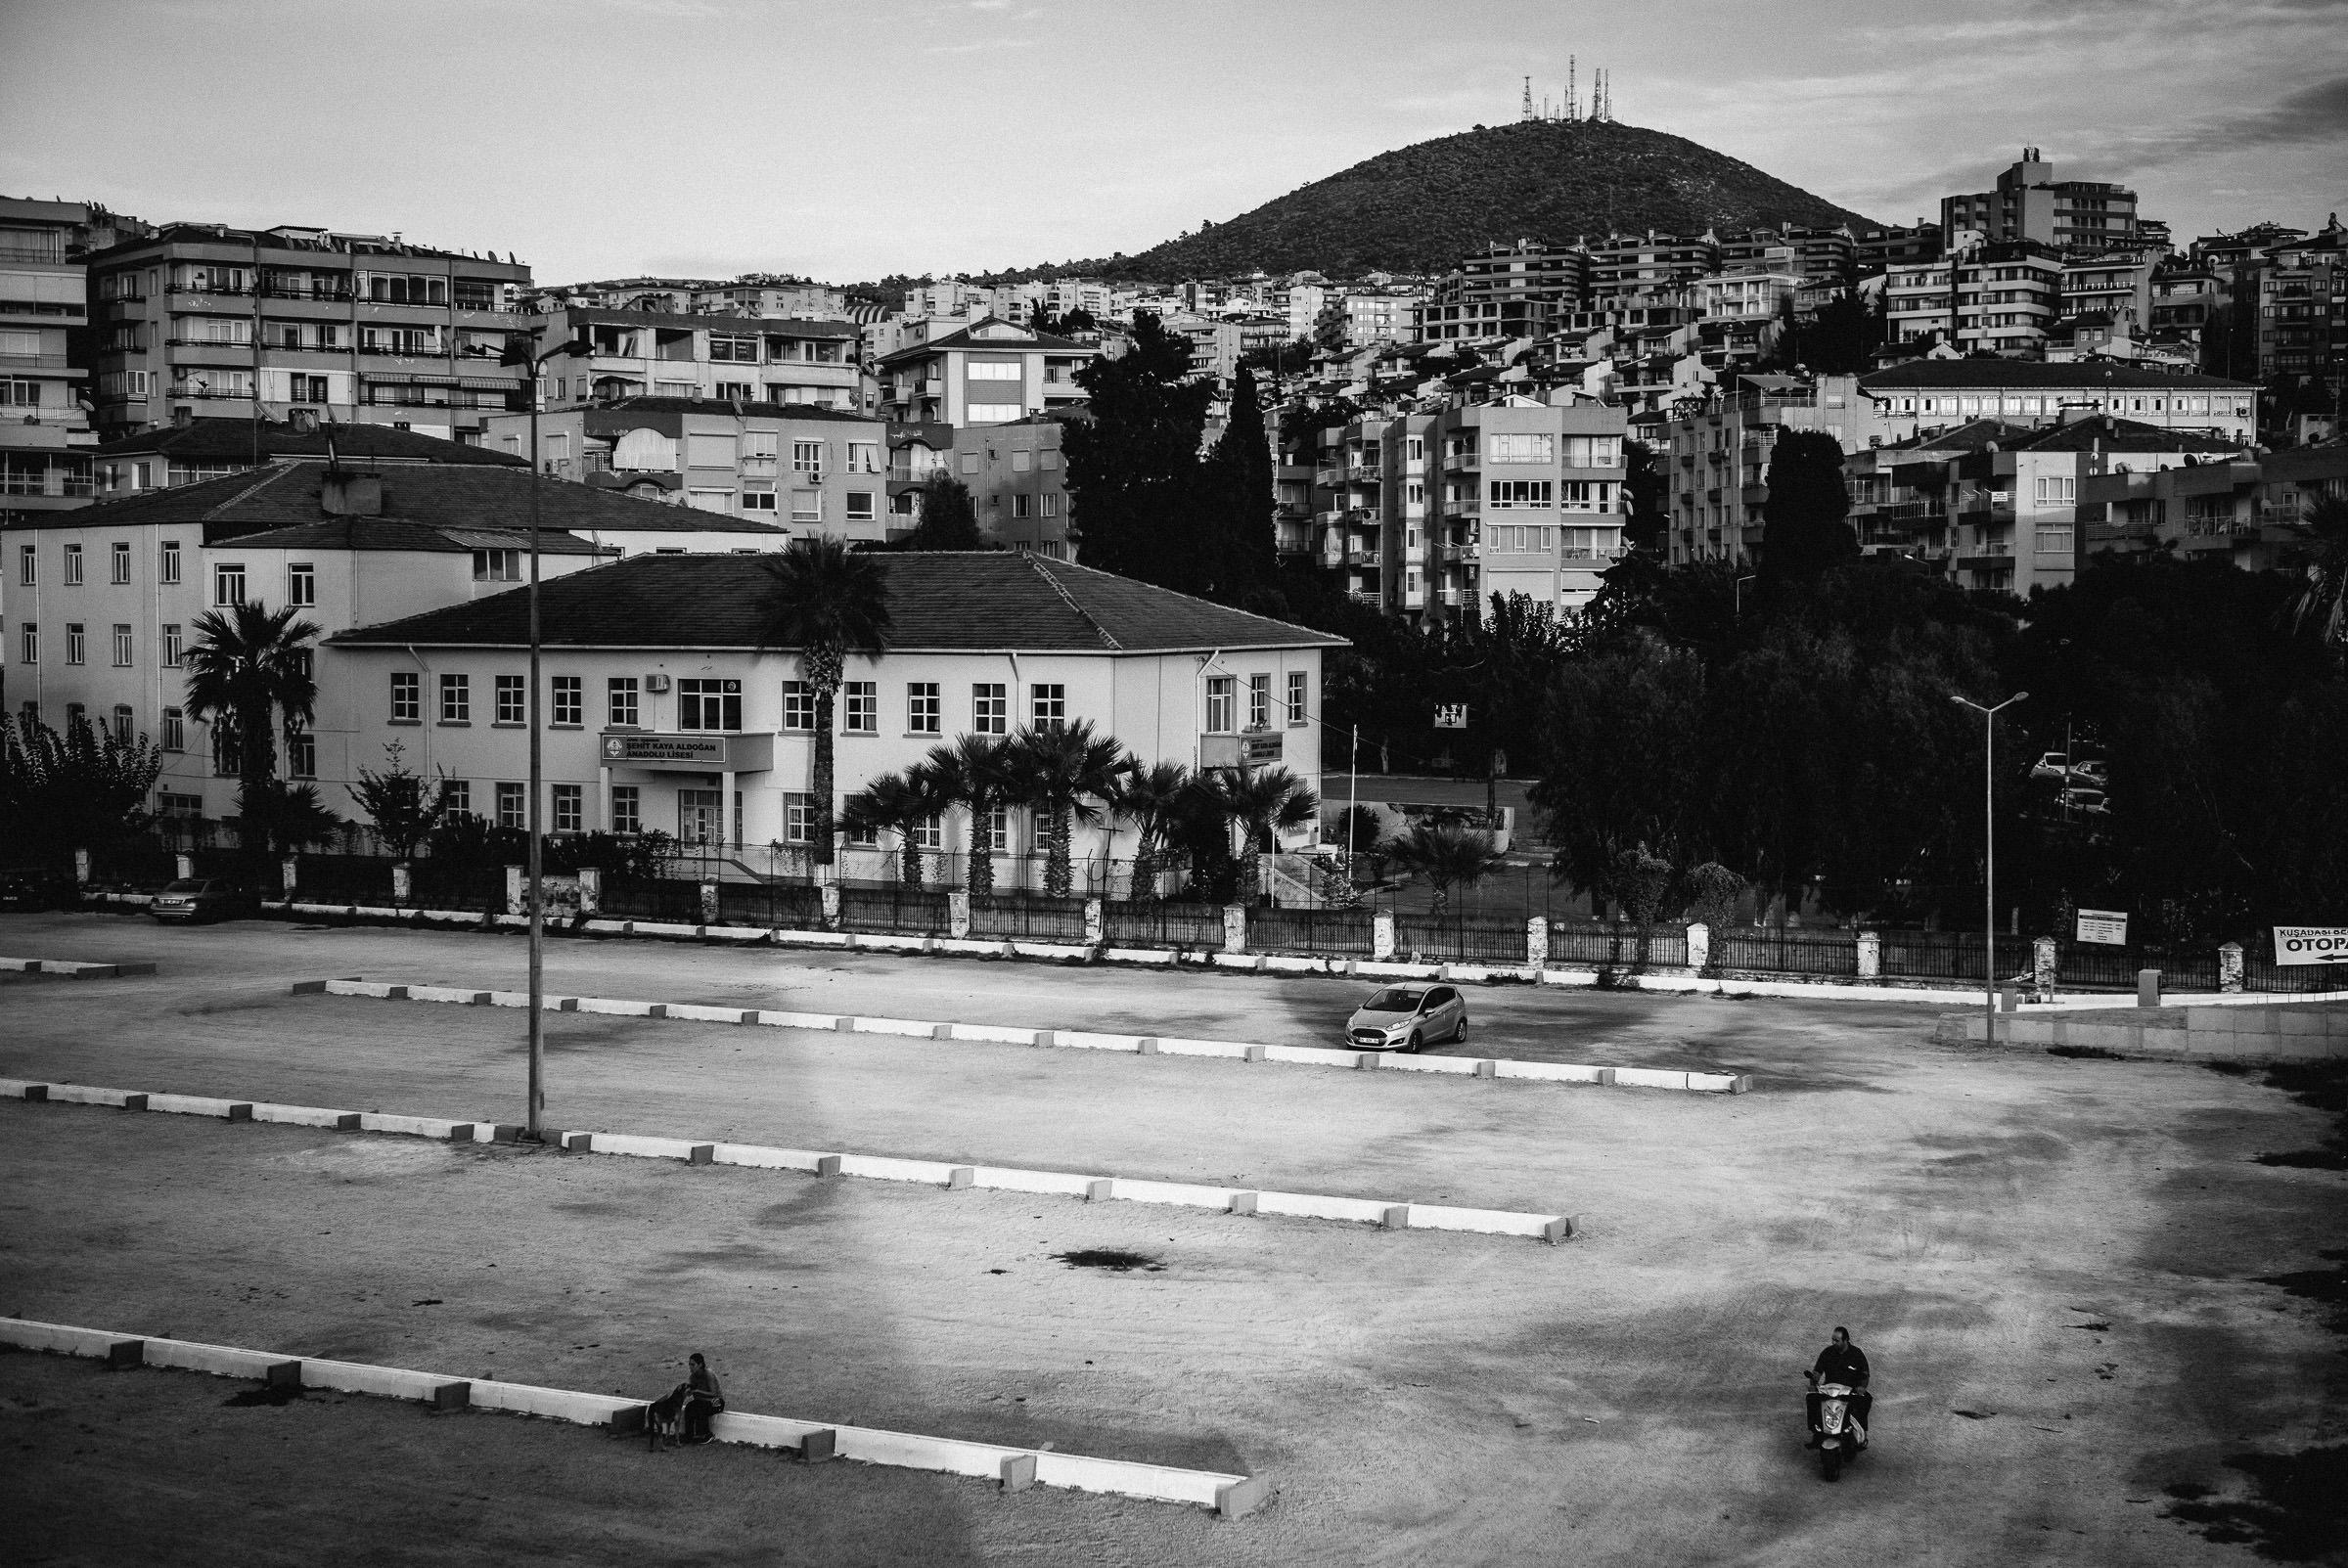 brandon_patoc_travel_photographer_in_turkey_0001.jpg